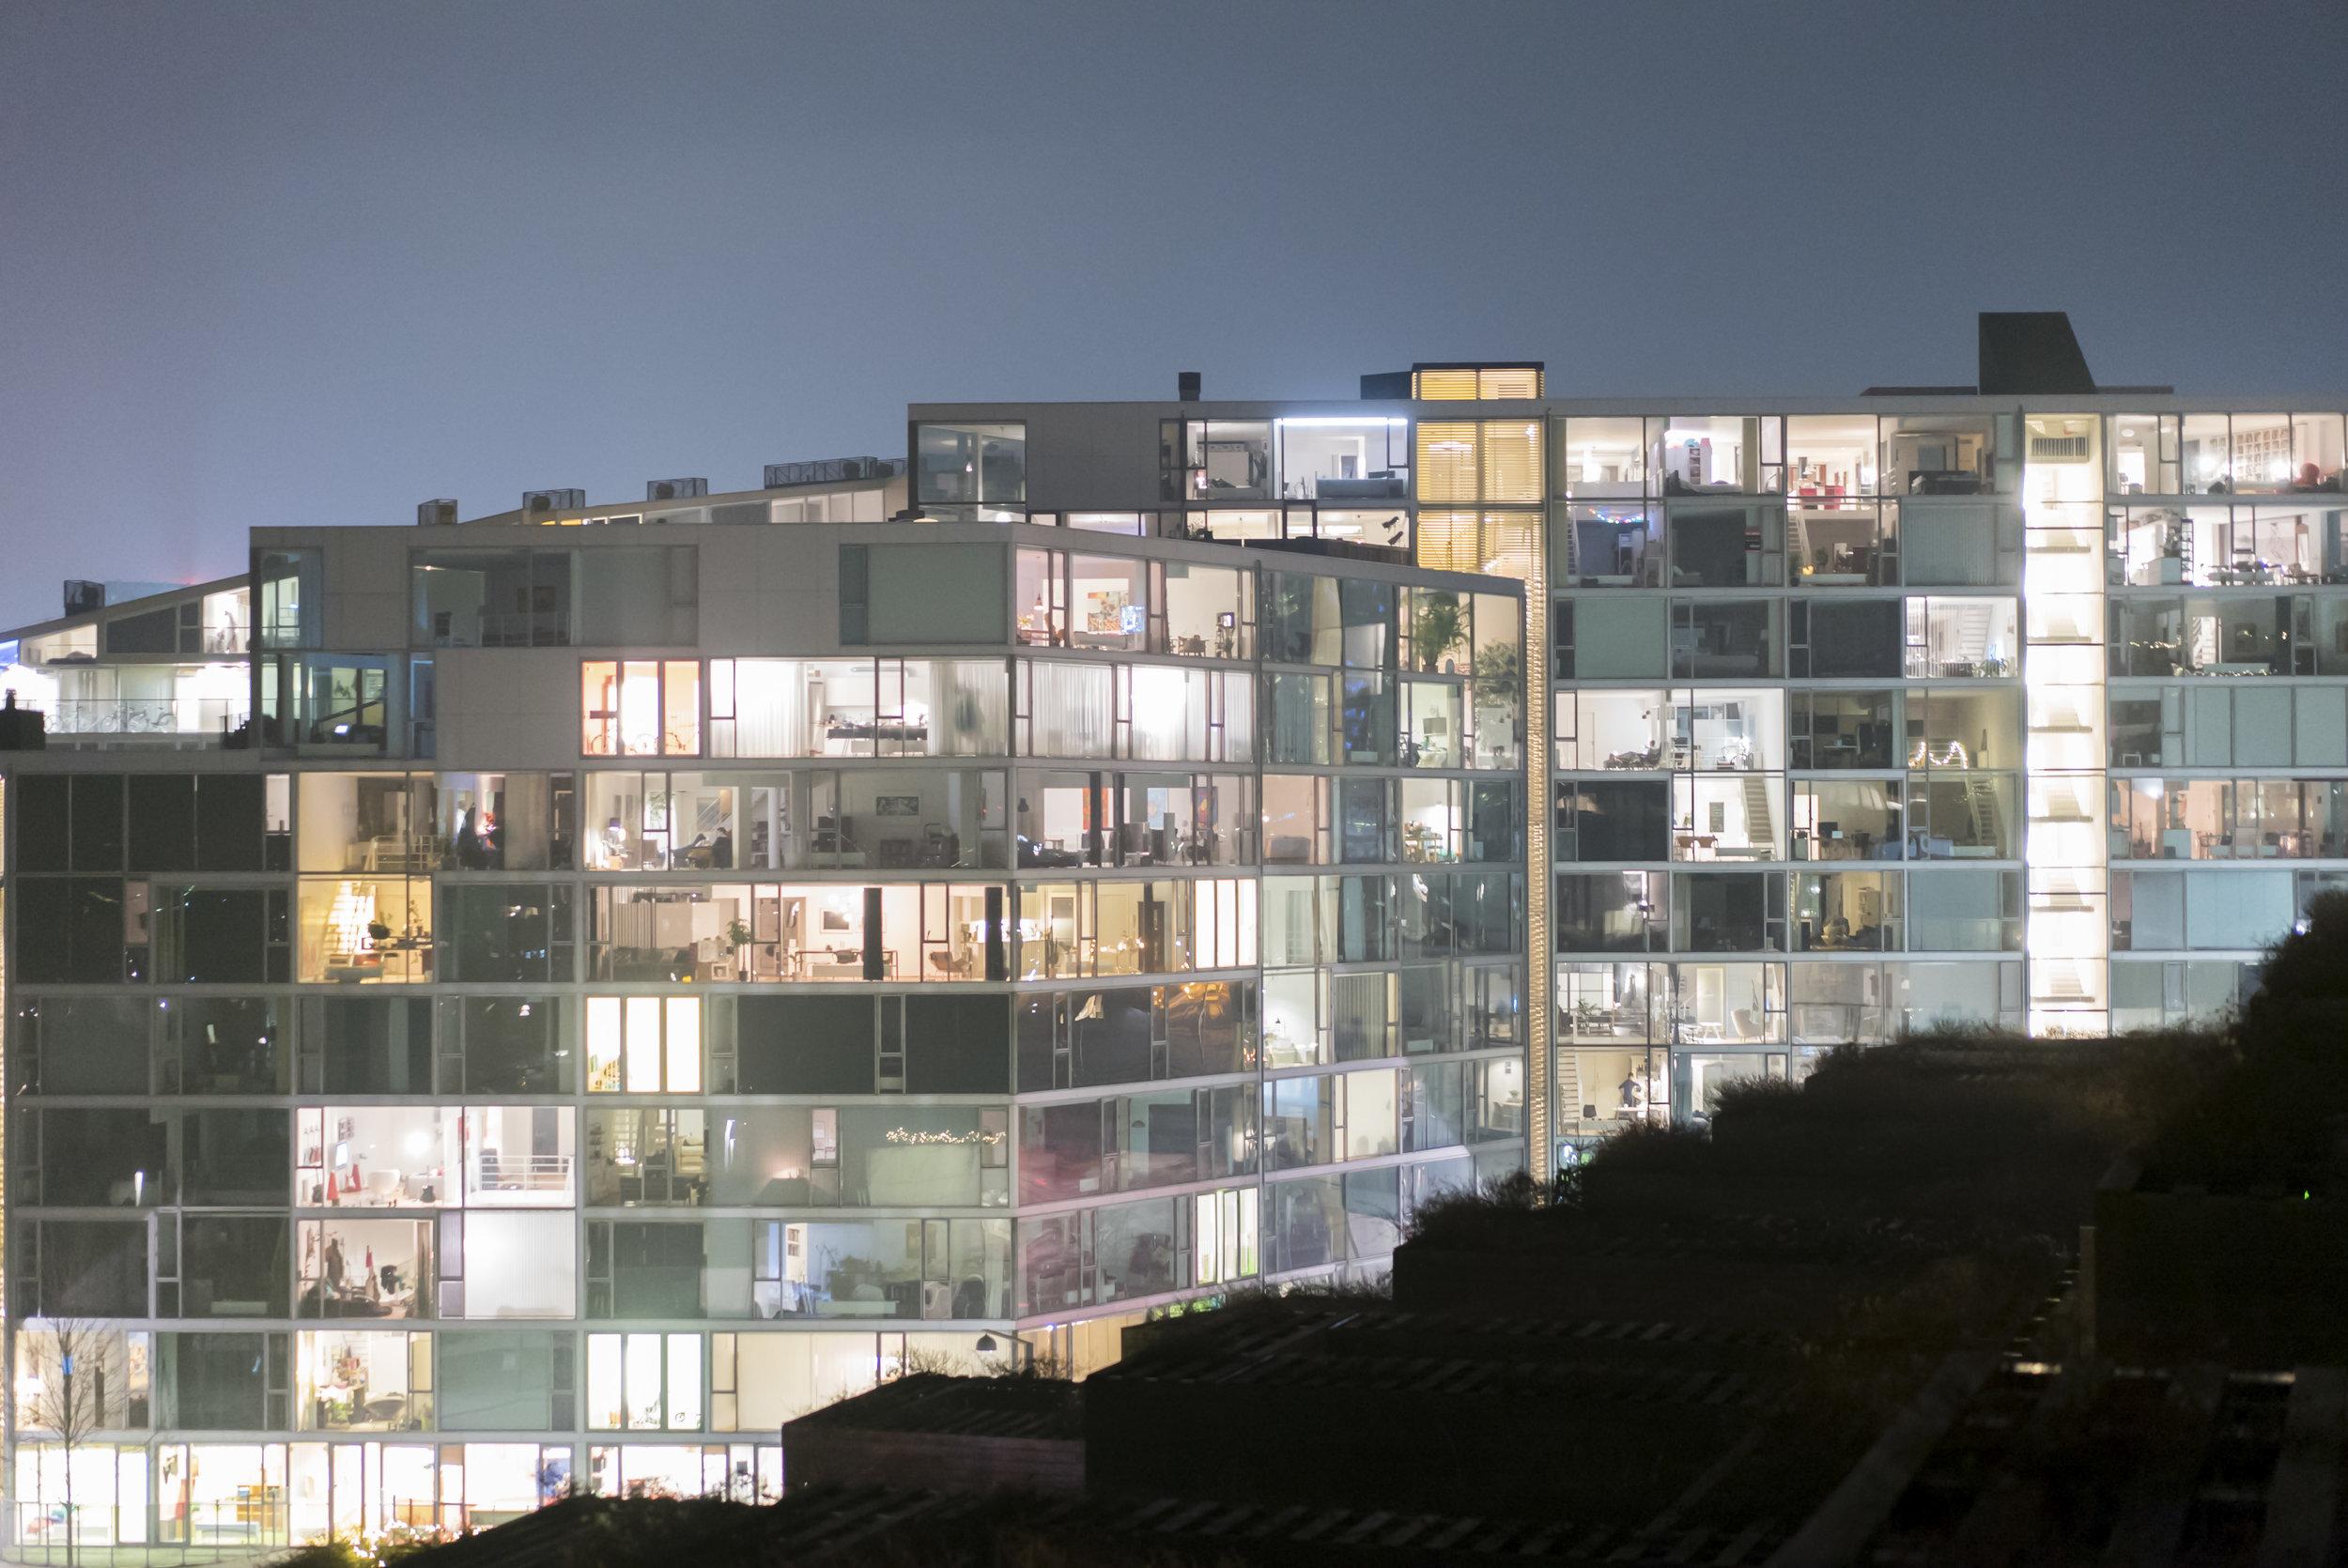 VM Houses exterior at night